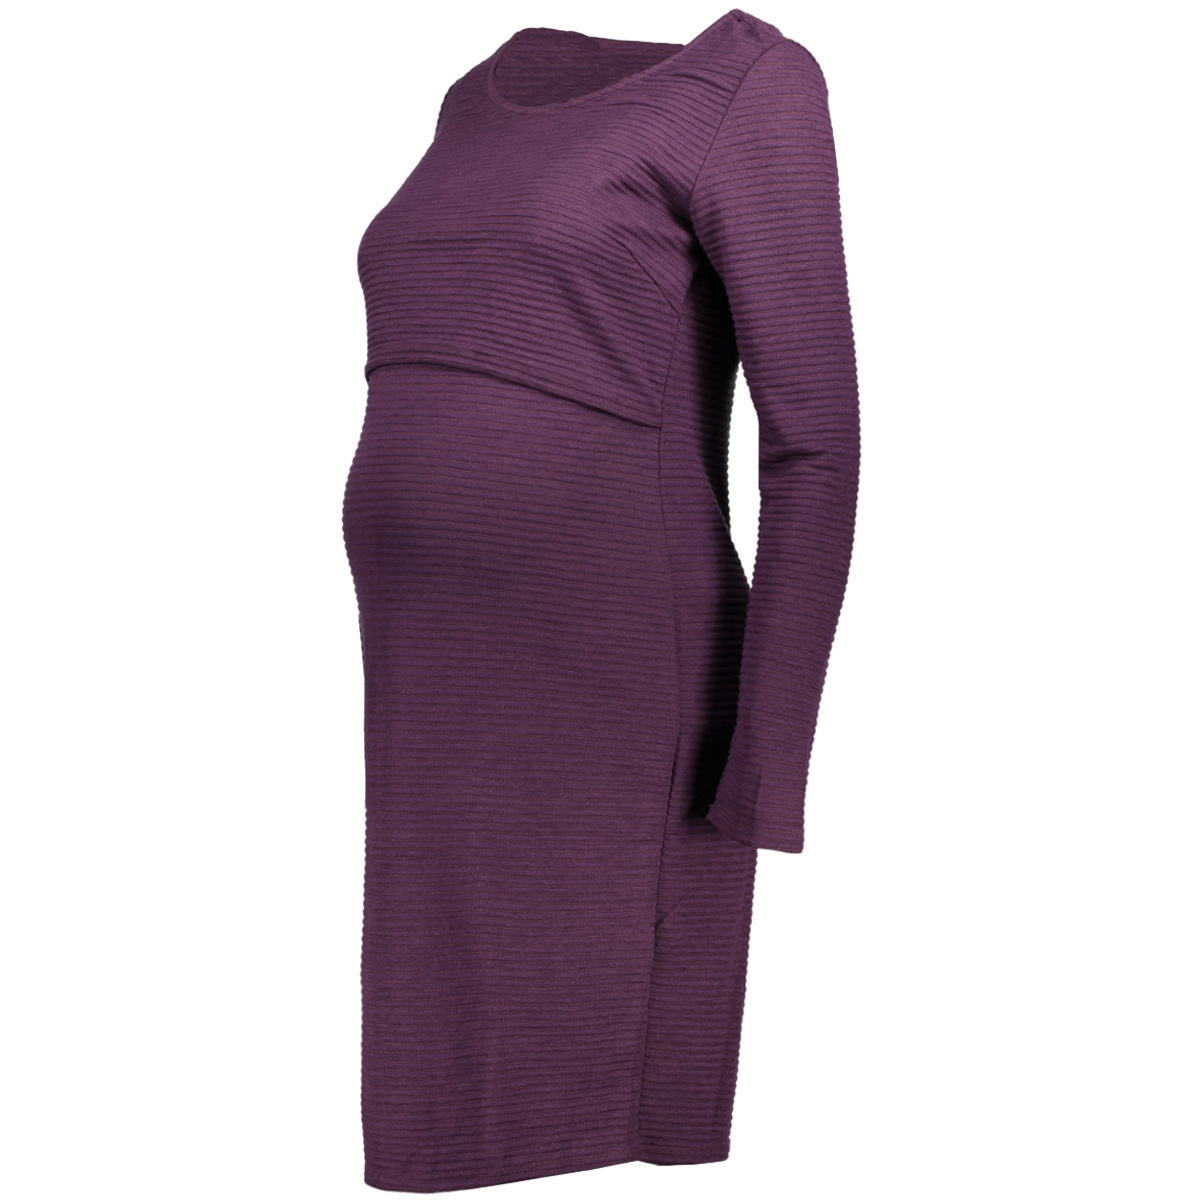 80730 dress nurs is mena noppies positie jurk c125 dark purple